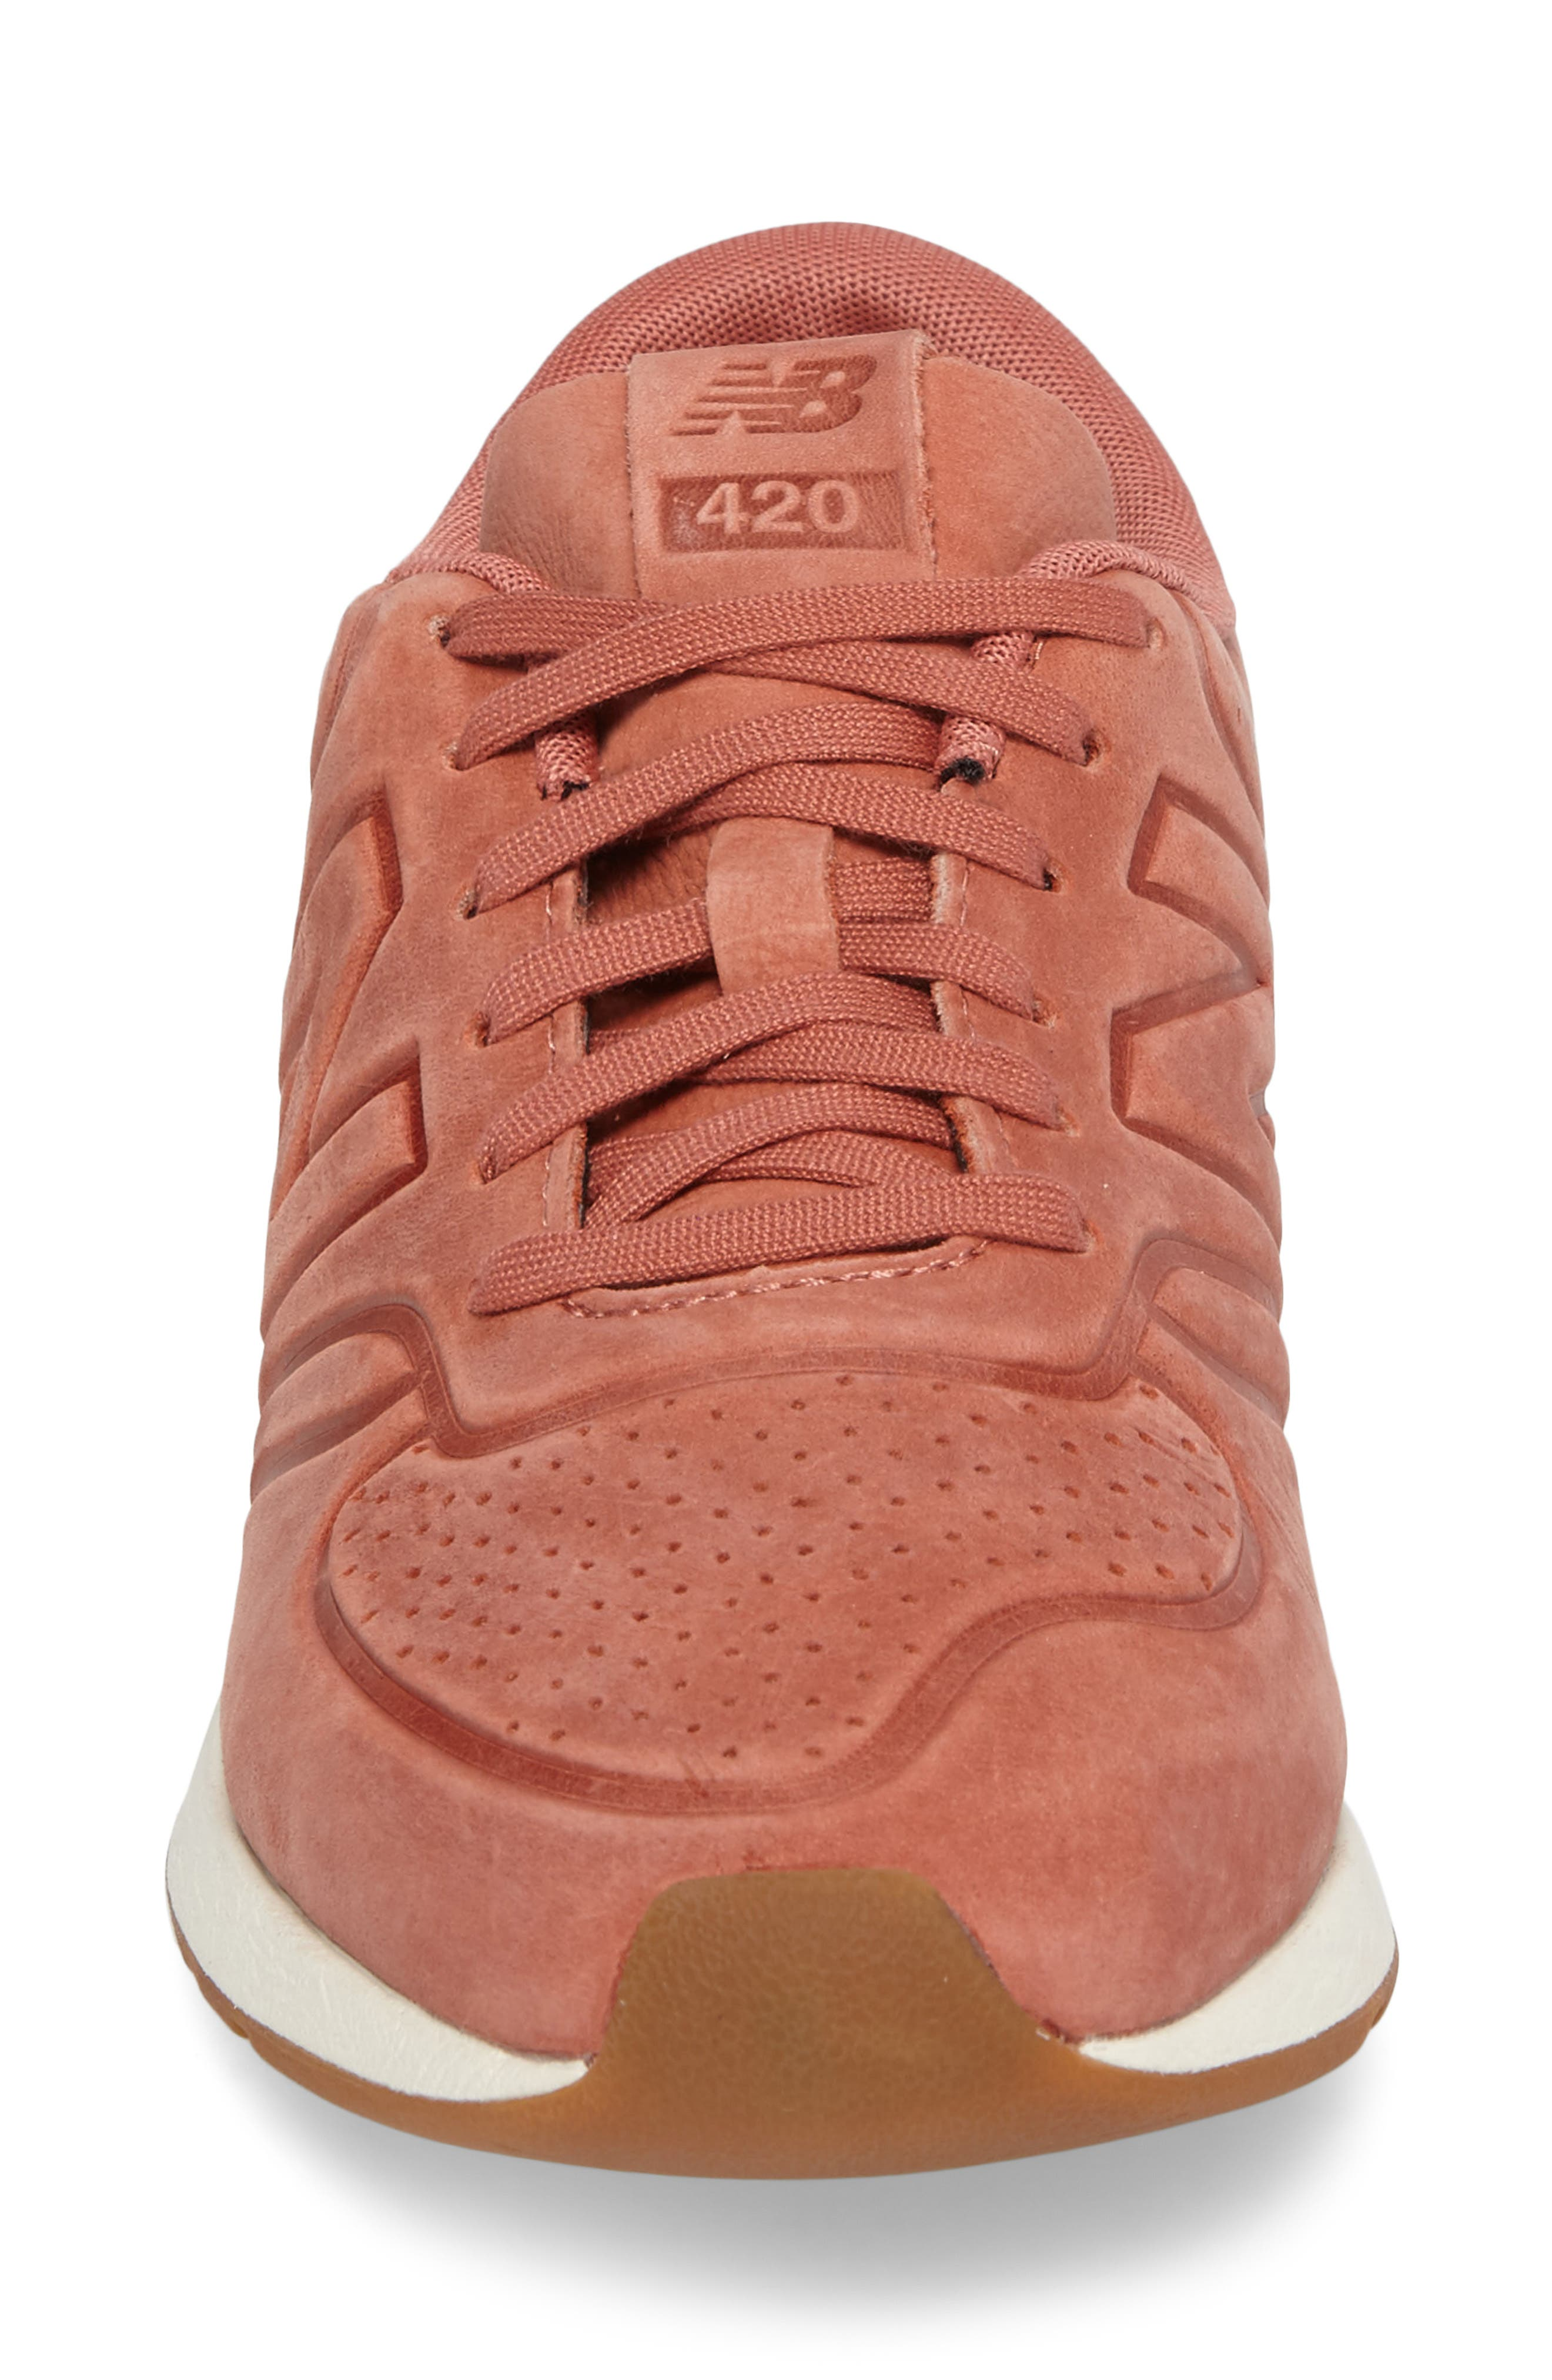 Alternate Image 4  - New Balance 420 Premium Decon Sneaker (Men)